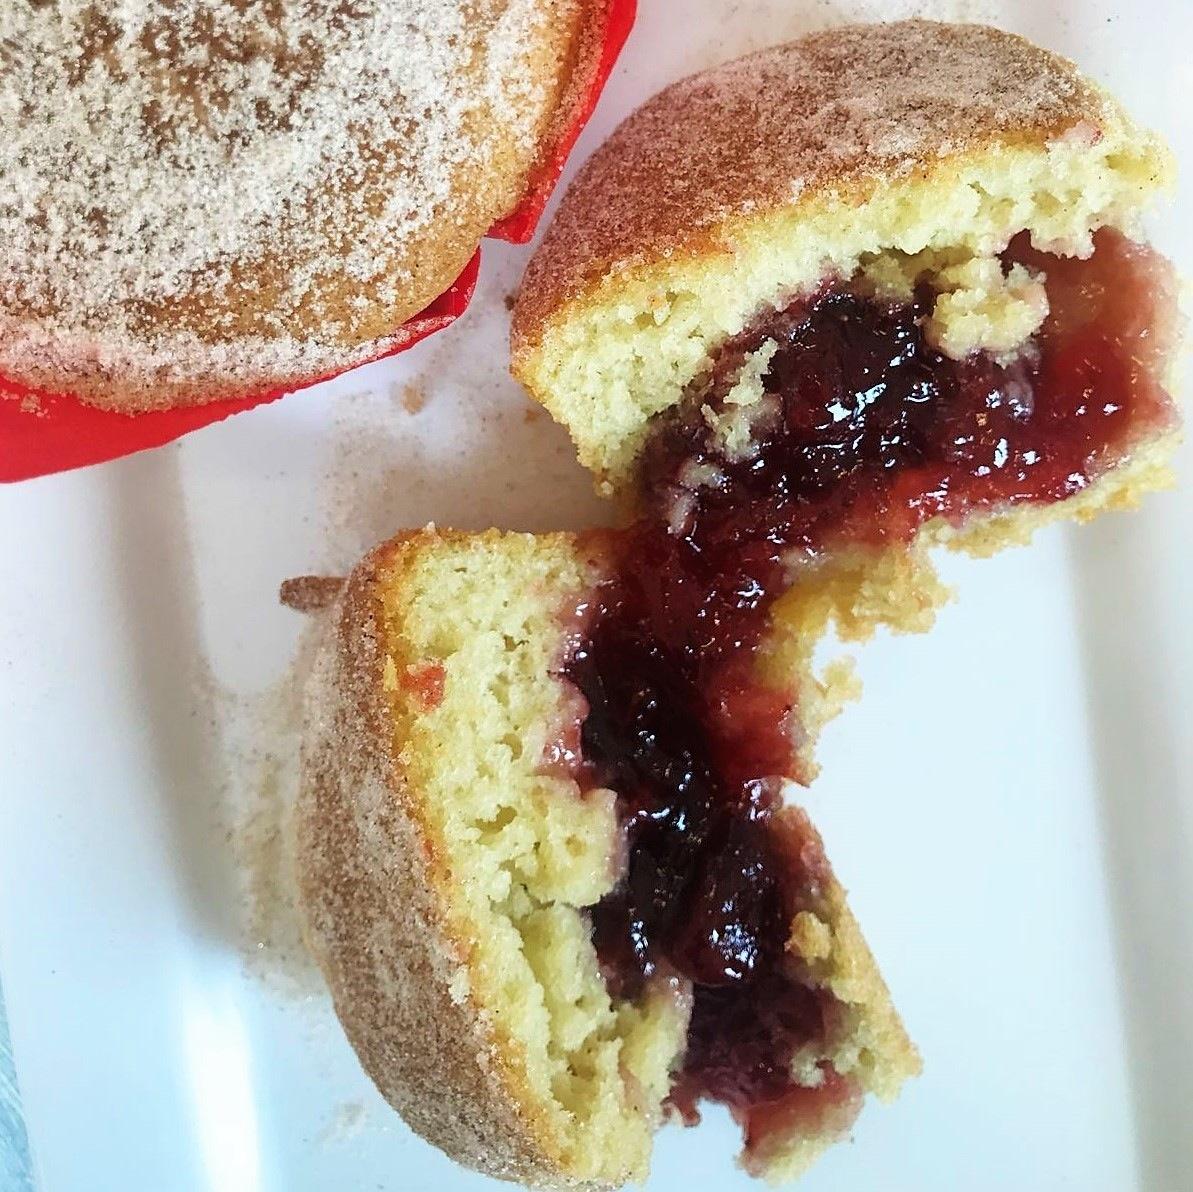 https://i1.wp.com/fatgayvegan.com/wp-content/uploads/2019/06/Jam-Doughnut-Muffin-1-2.jpg?fit=1193%2C1192